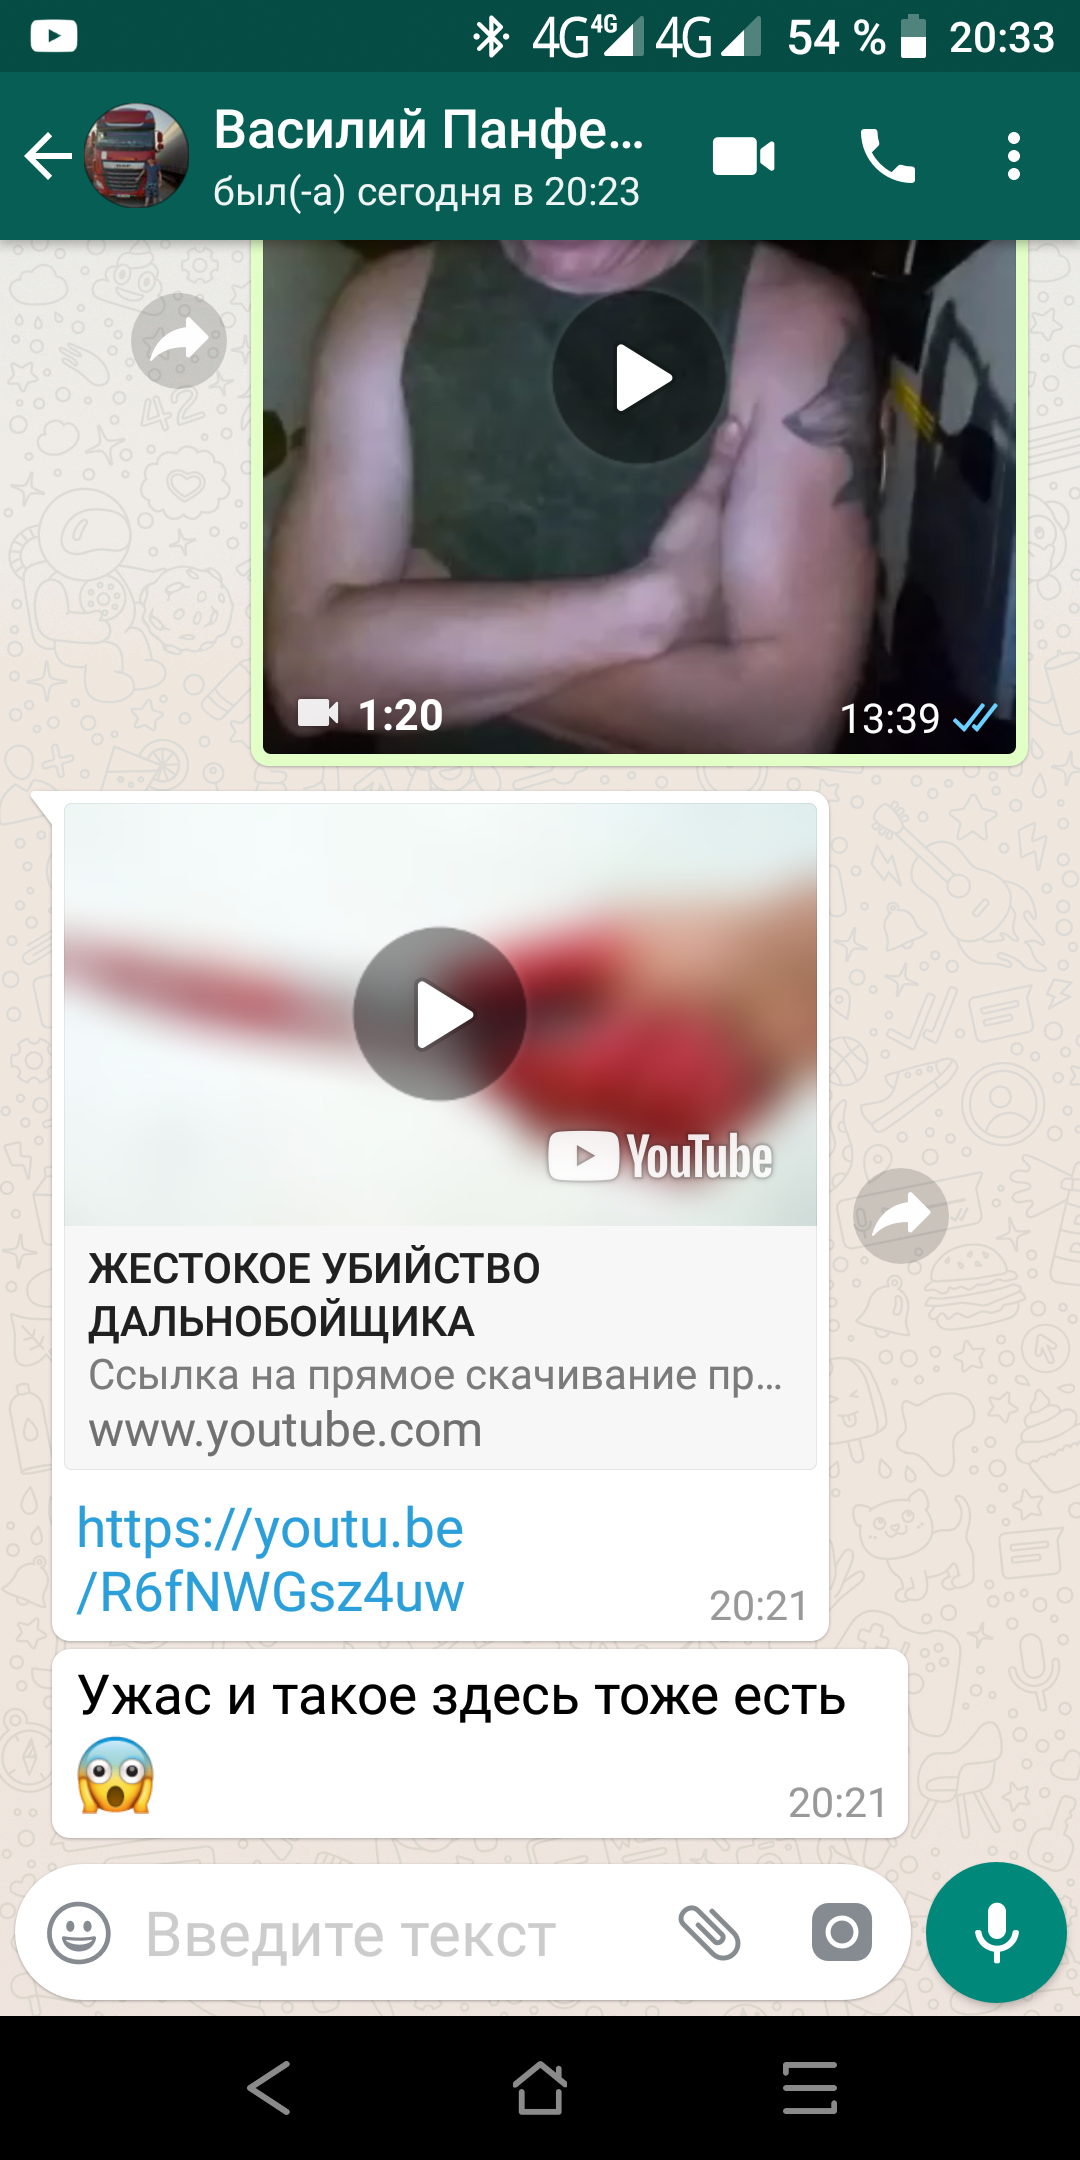 Screenshot_20190810-203311.png